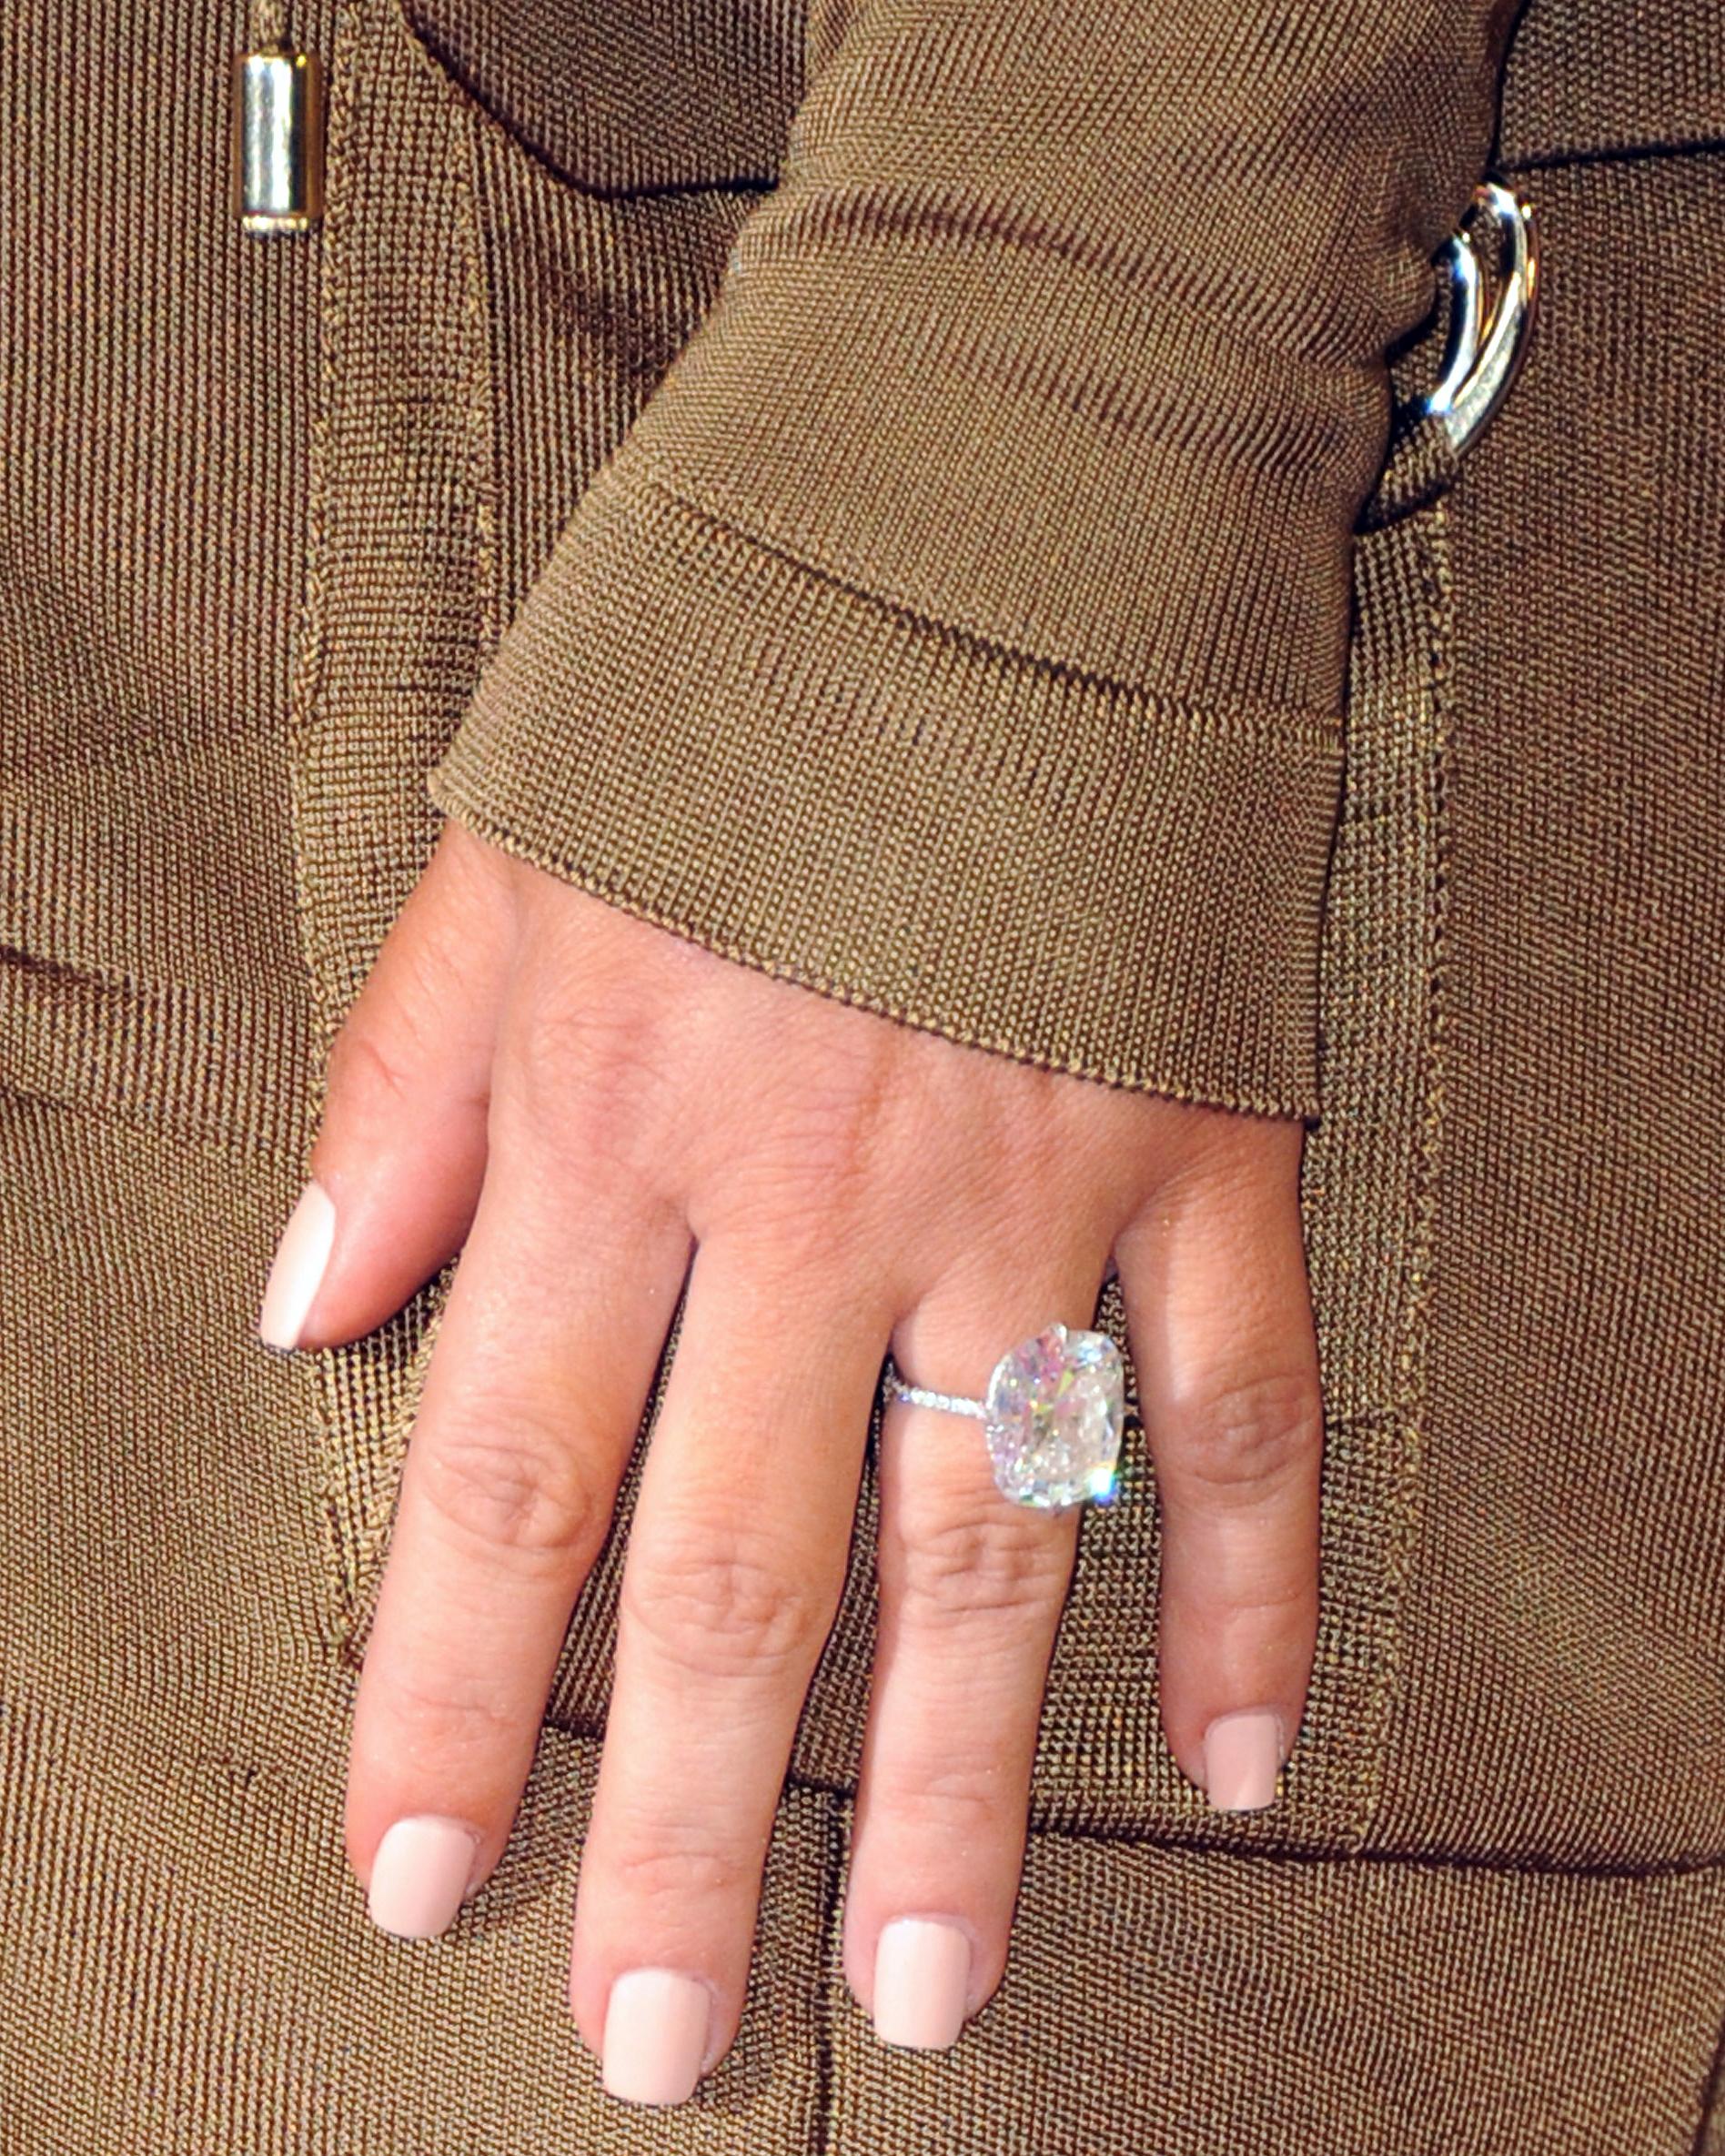 celebrity-engagement-rings-kim-kardashian-1015.jpg